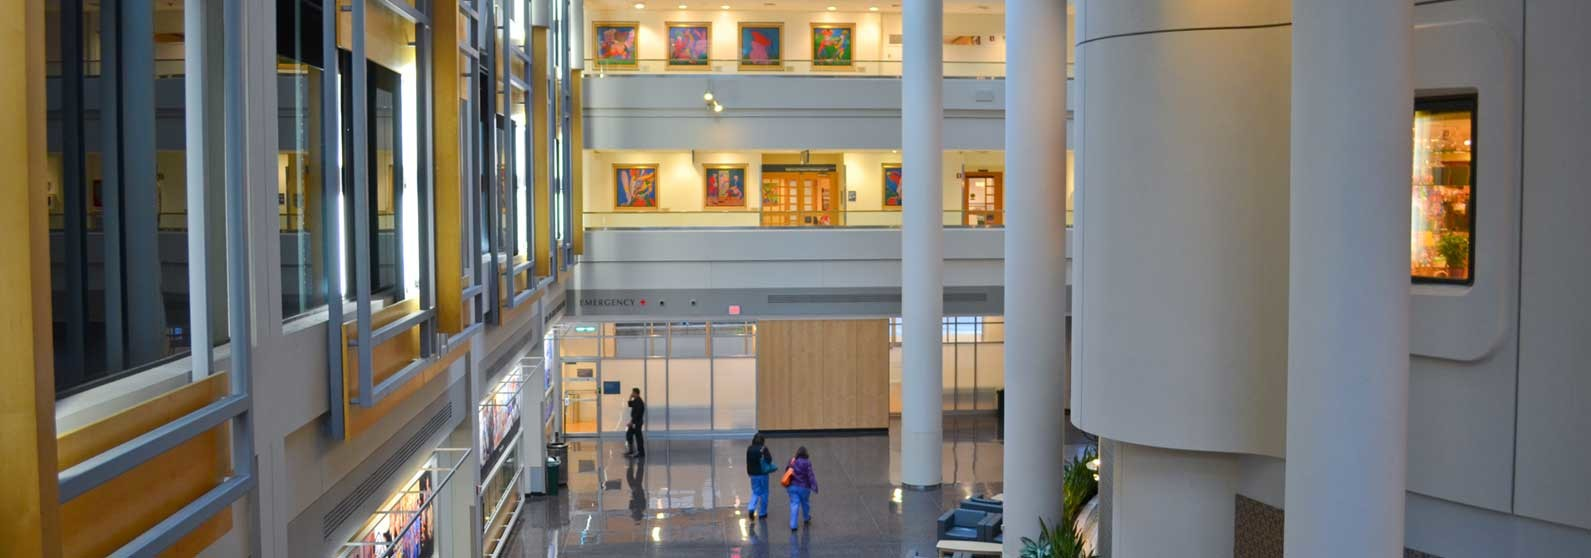 The Lobby at Brigham & Women's Hospital